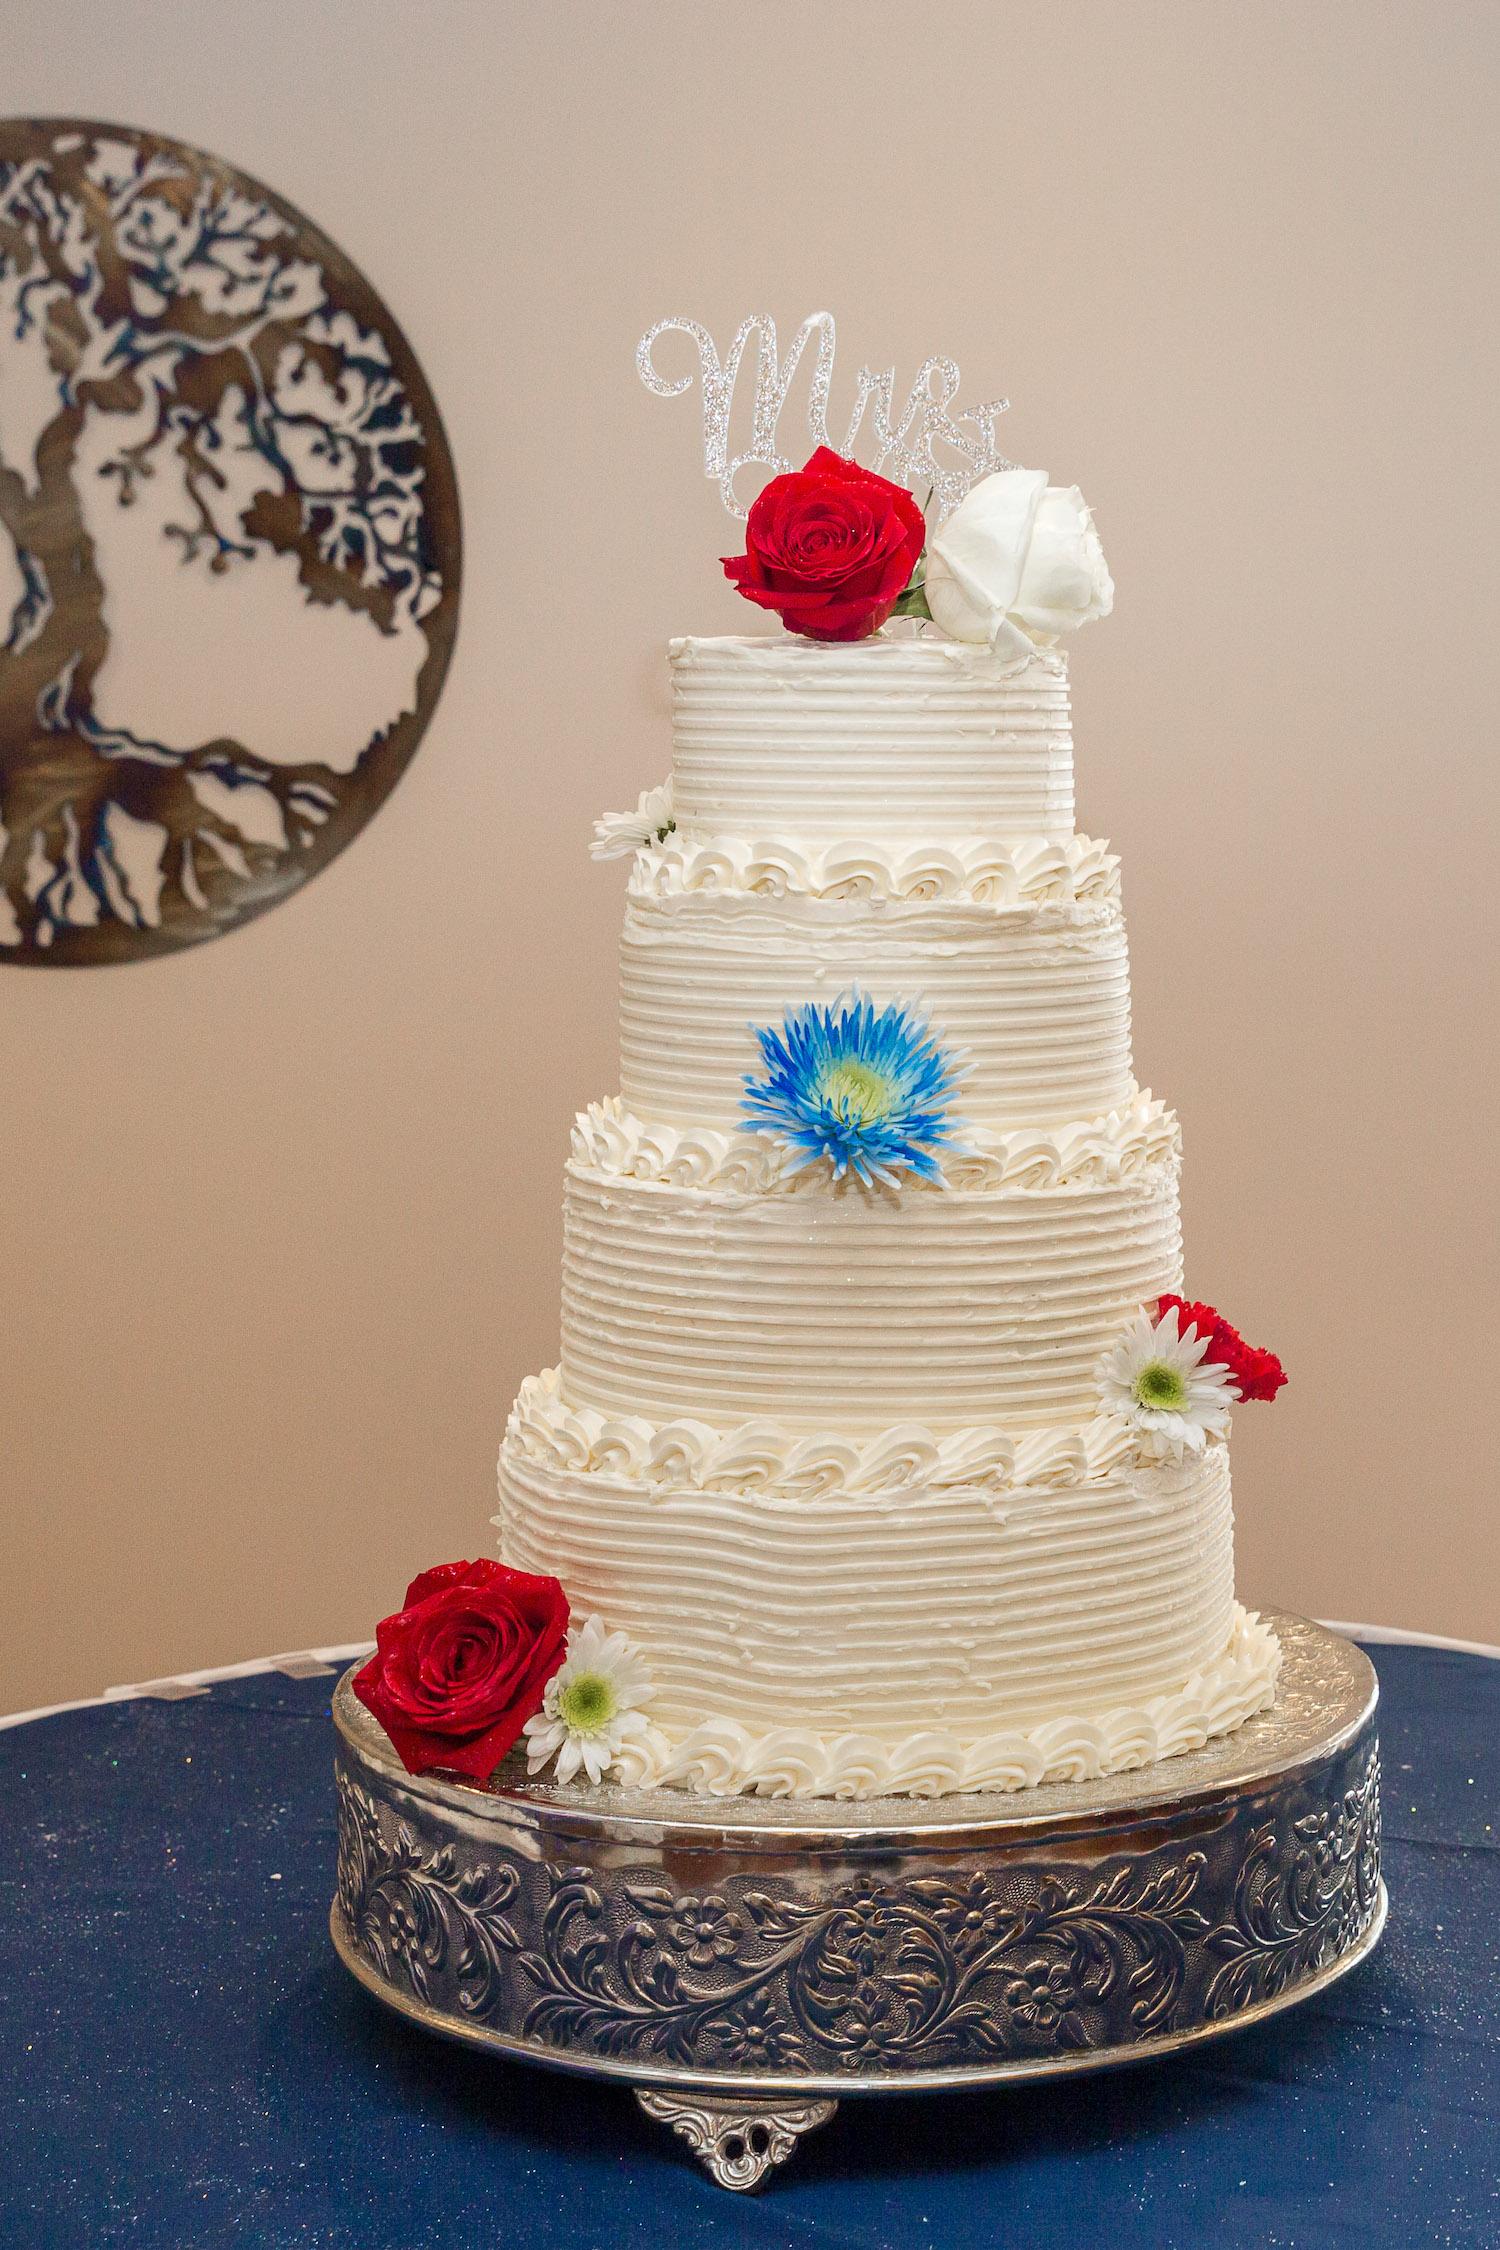 Rosehenge wedding, Lakeville wedding venue, affordable wedding venue in south Minnesota, tiered wedding cake